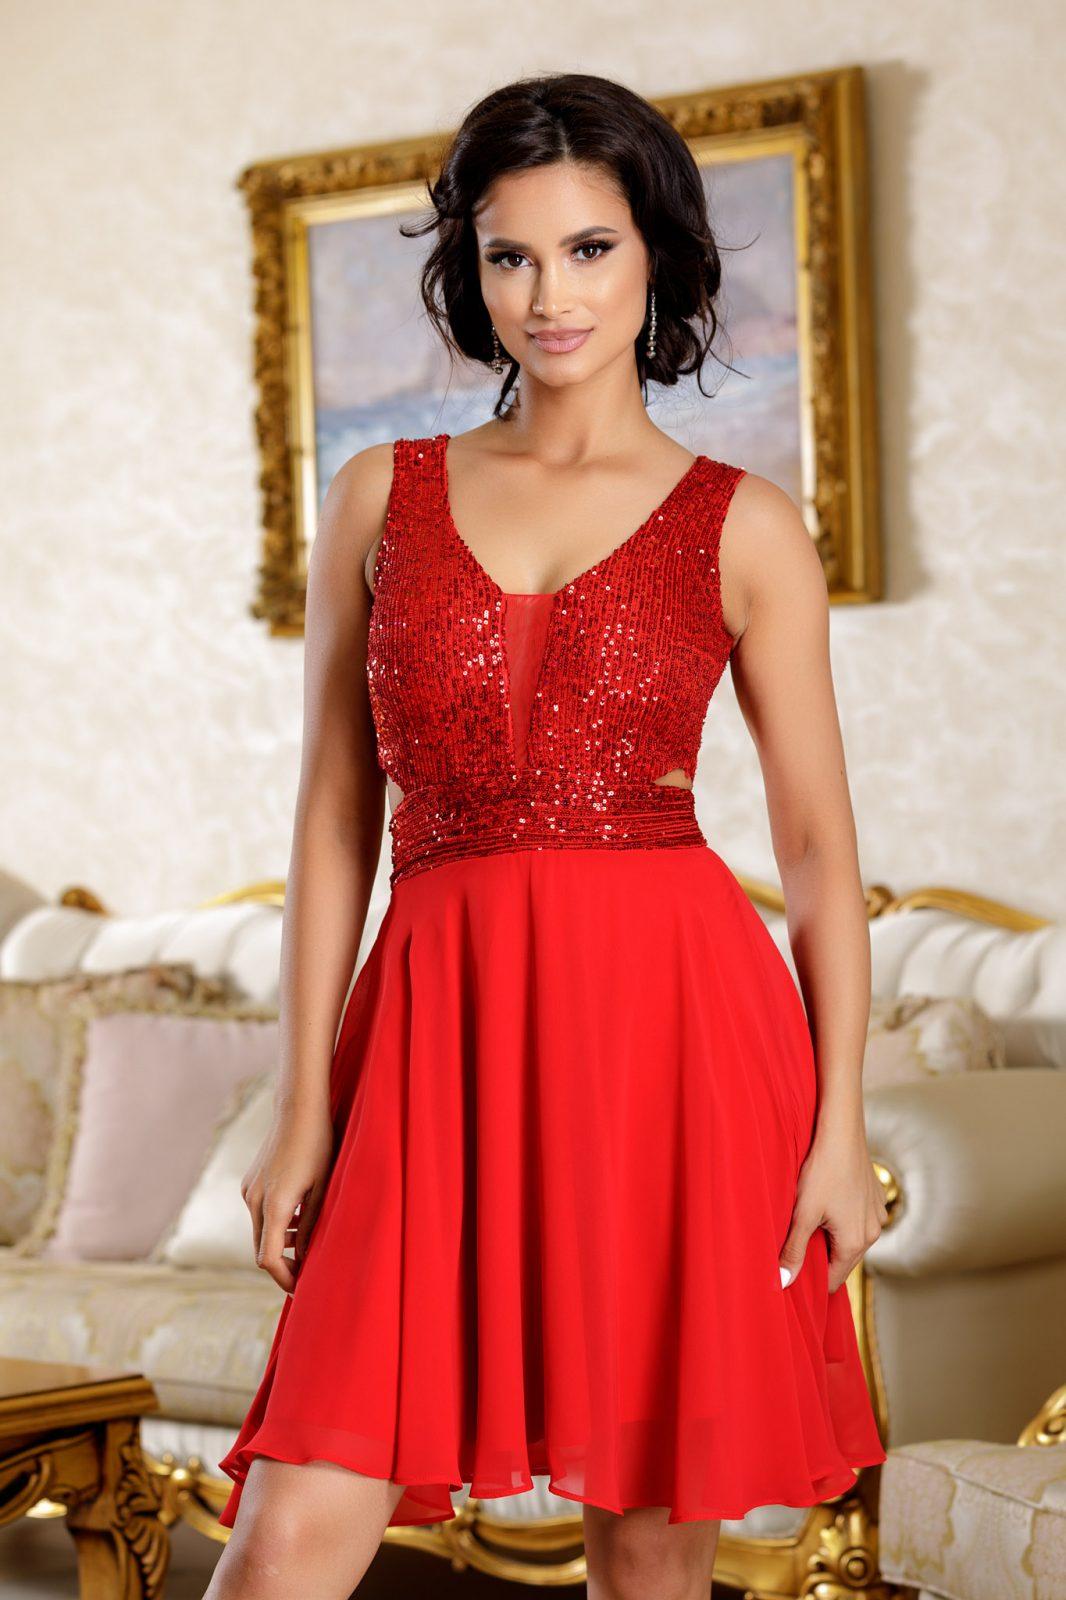 Aydin Red Dress